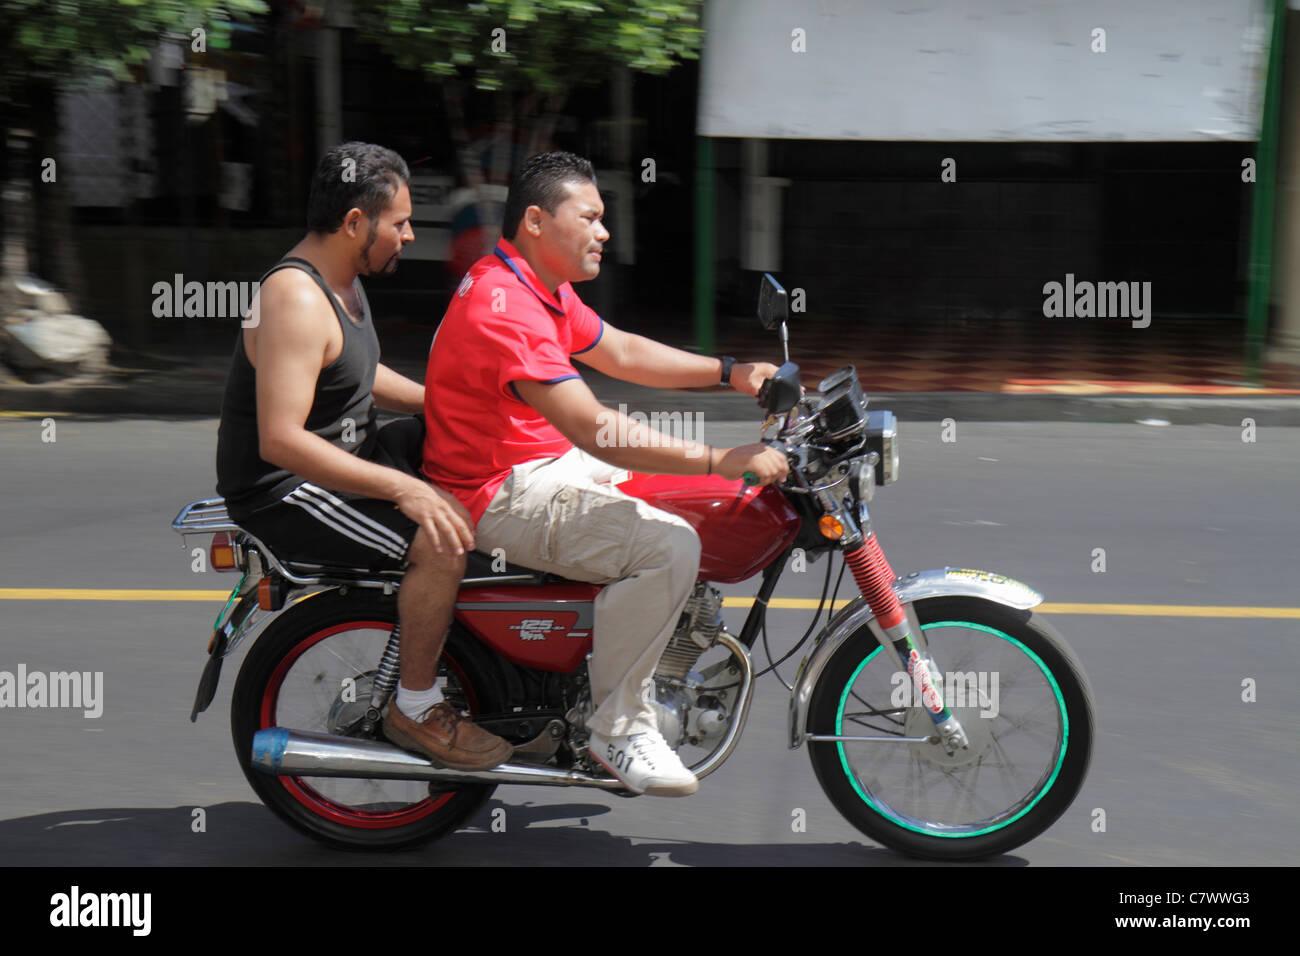 Managua Nicaragua street scene motion Hispanic man driver rider passenger motorcycle riding no helmet unsafe motion - Stock Image